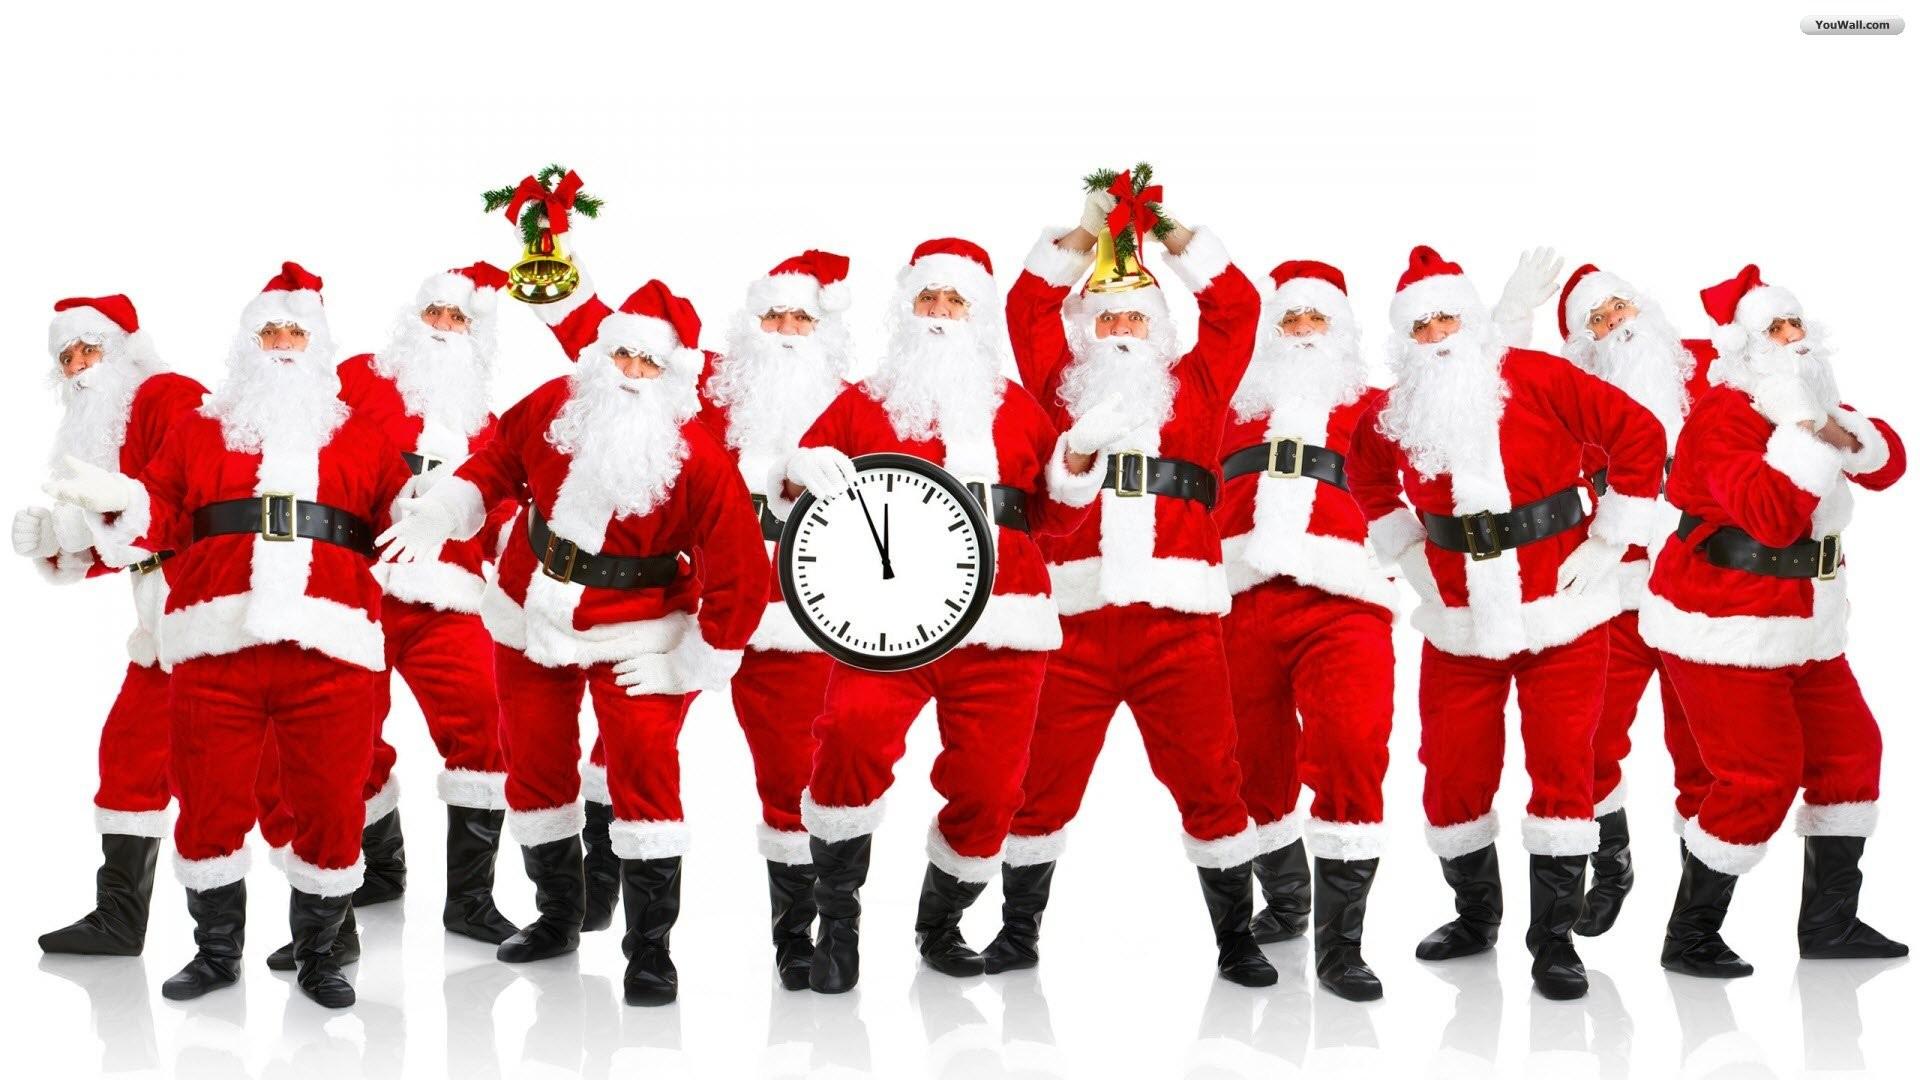 Santa Claus Group Wallpaper